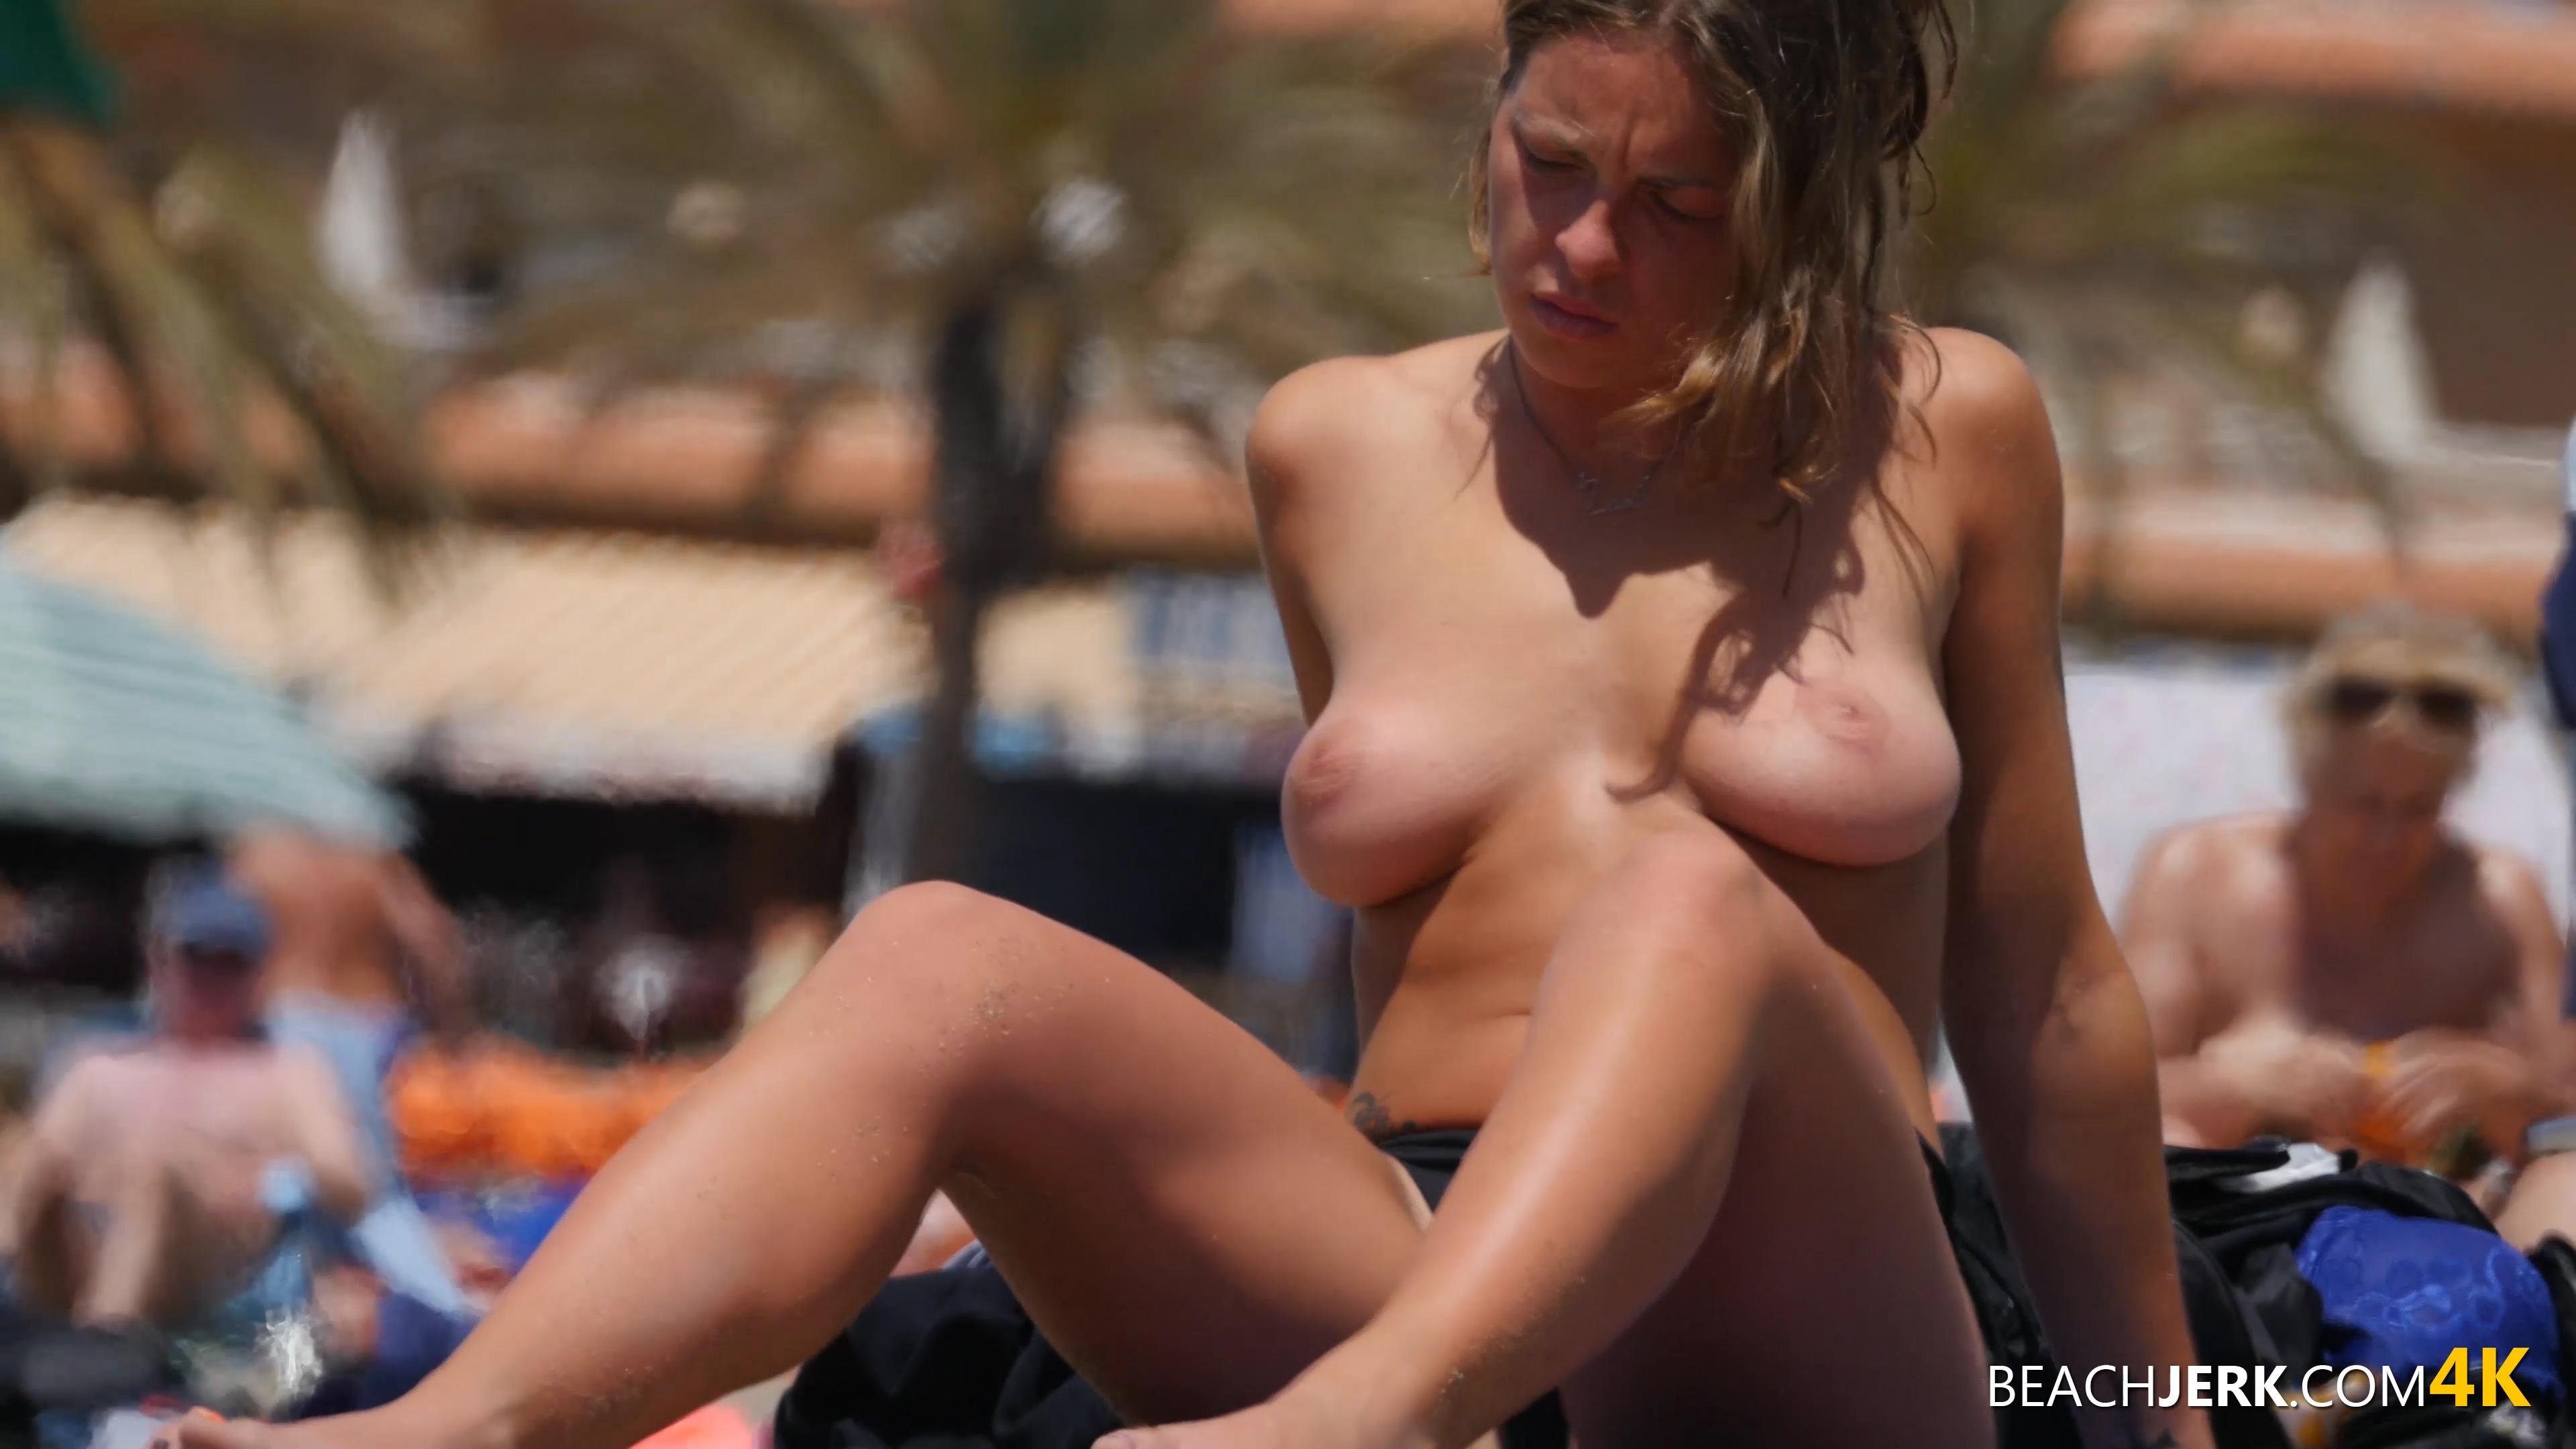 Beachjerk